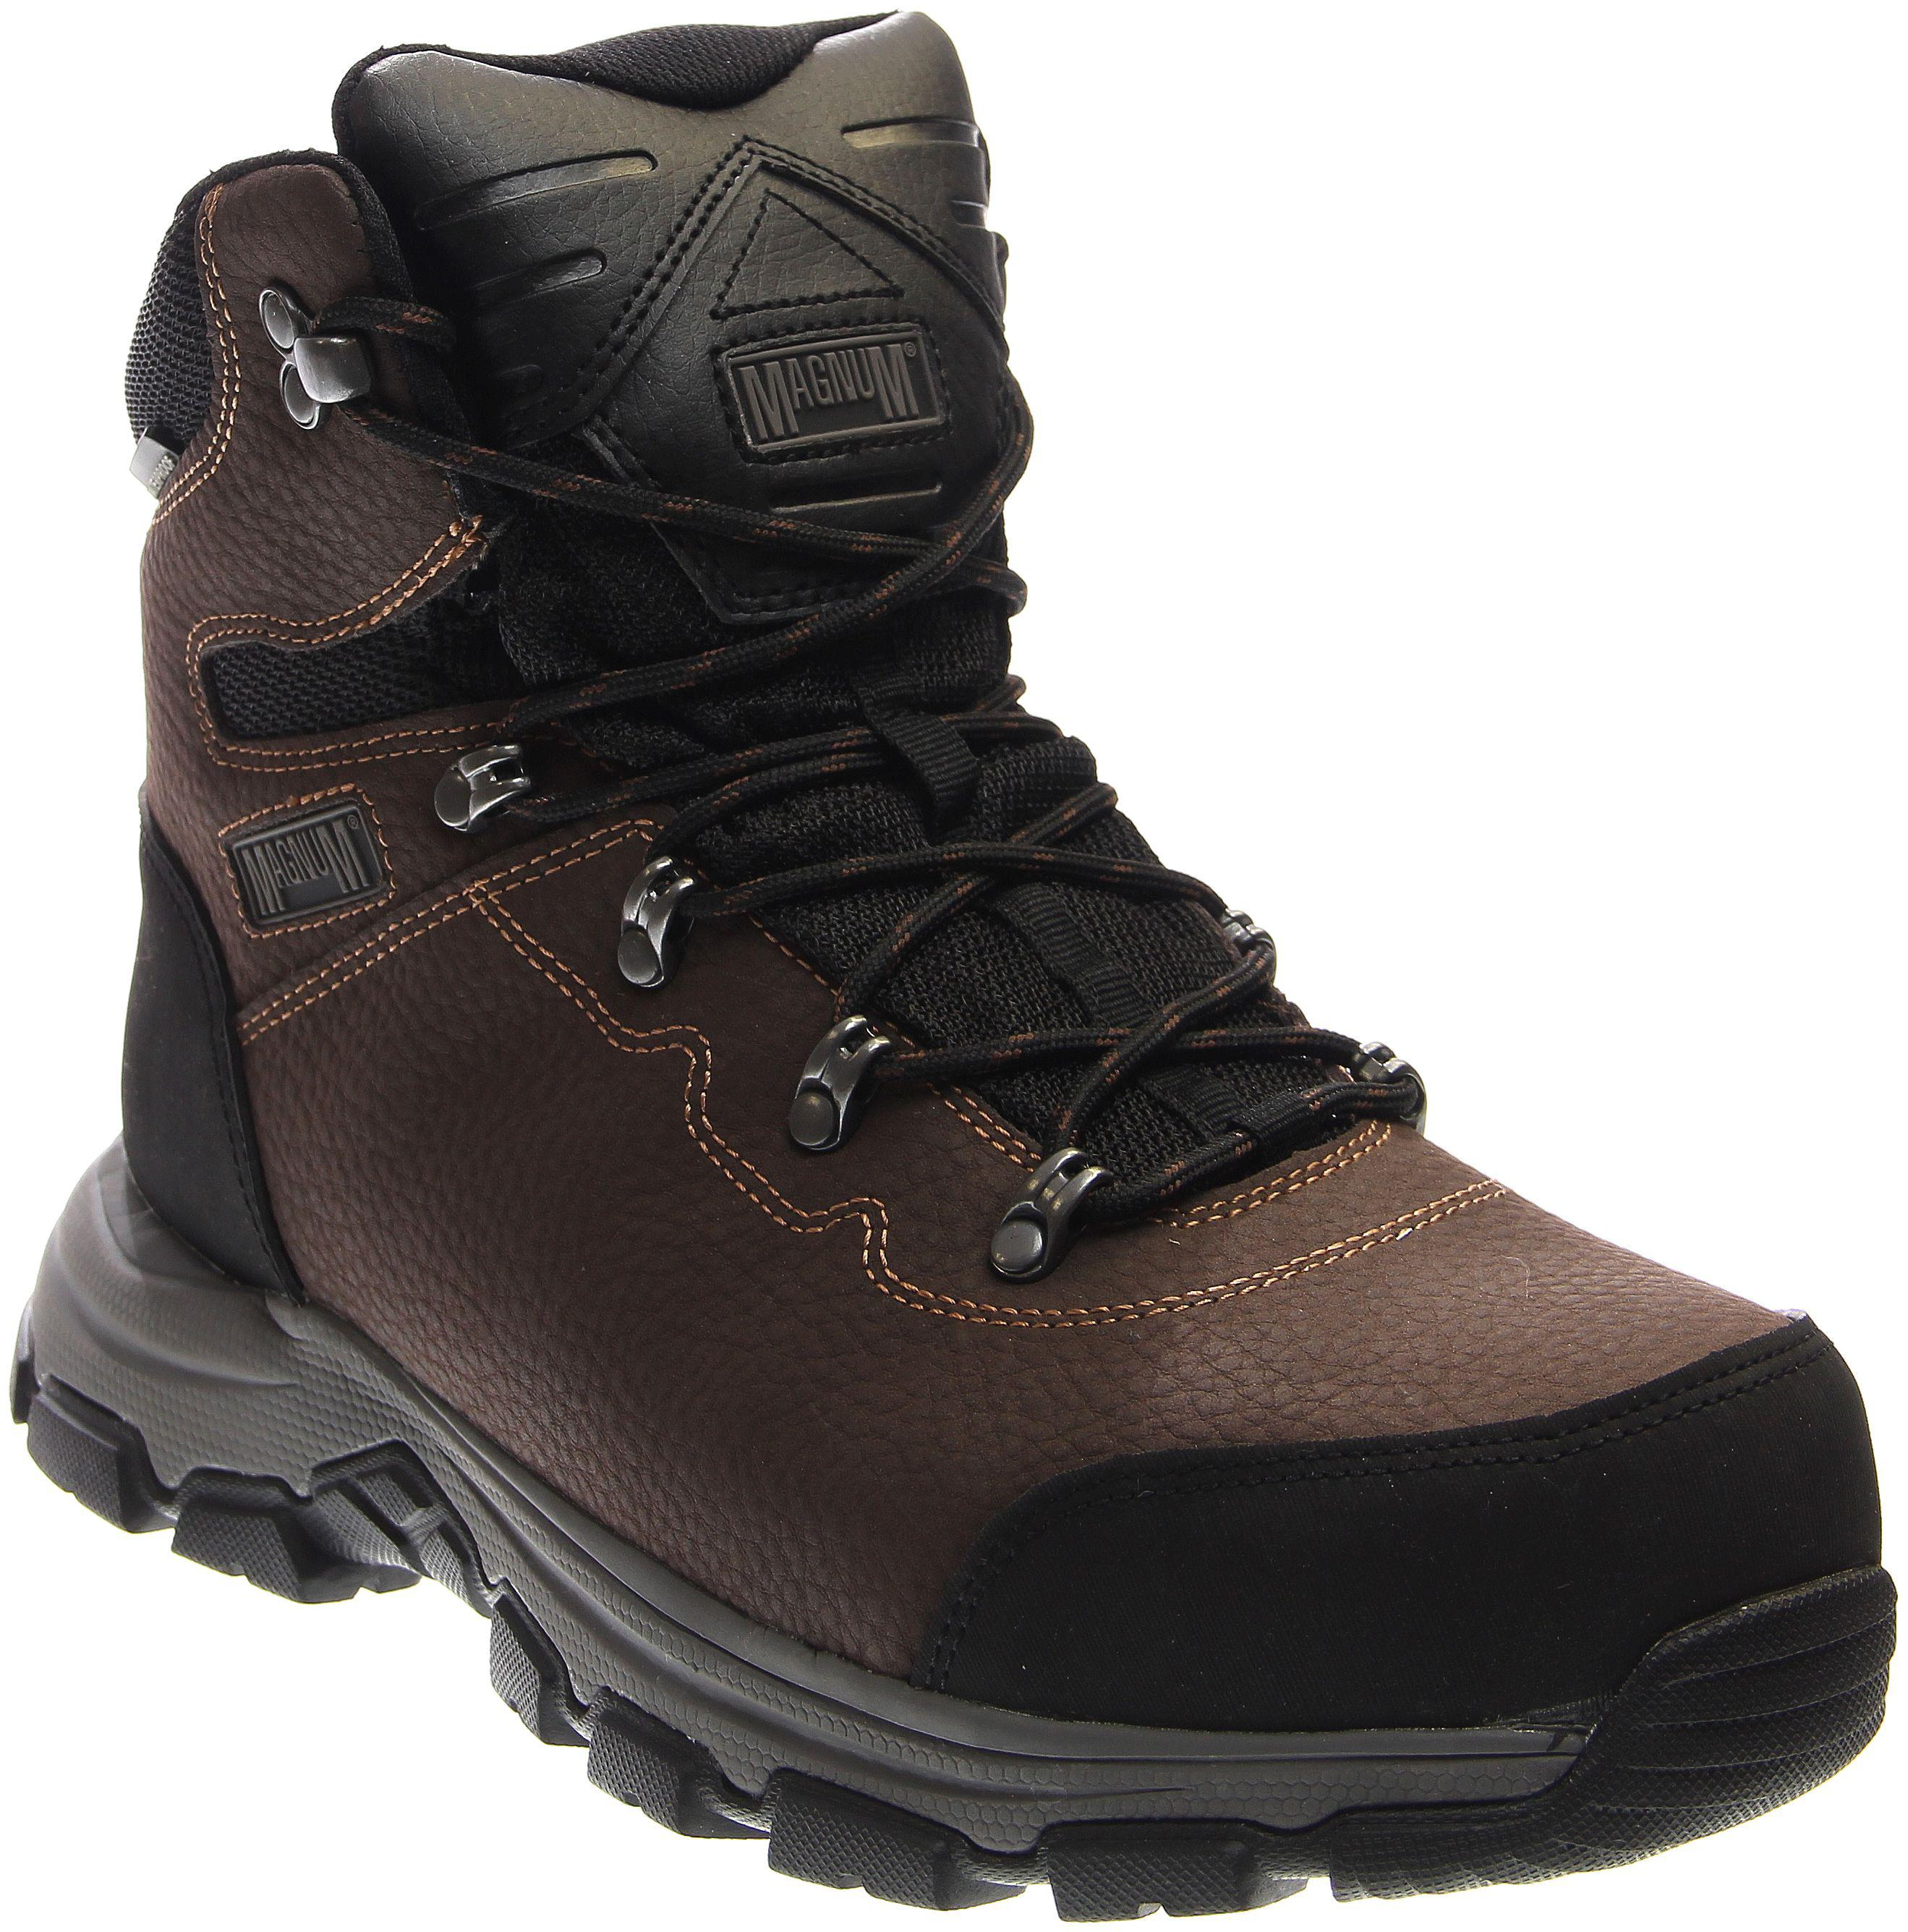 c27340a4720 Lyst - Magnum Men's Austin Mid Waterproof Steel Toe Work Boots in ...